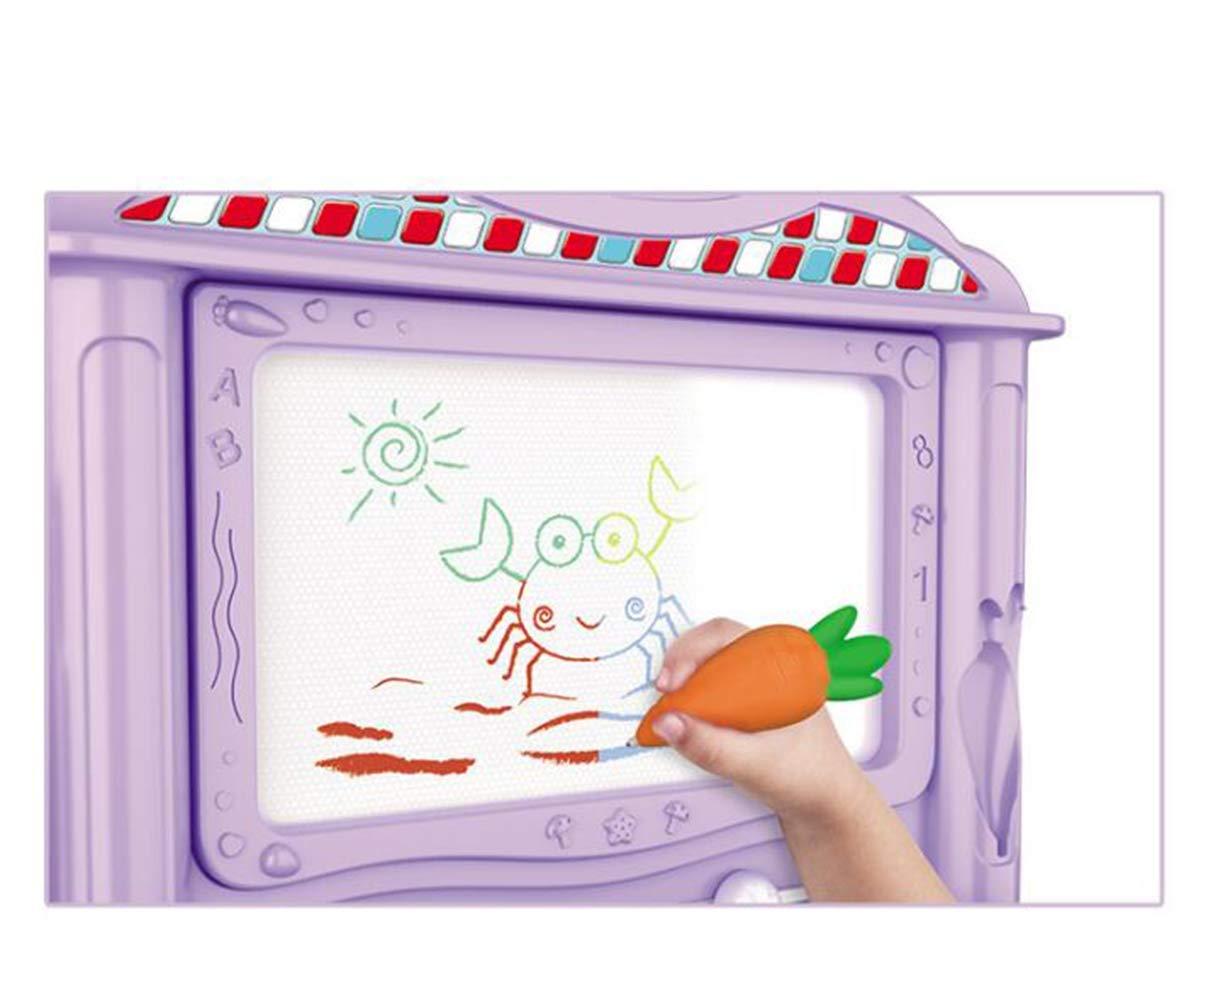 KESS InHouse Rosie Brown Welcome Spring Orange Green Fleece Baby Blanket 40 x 30